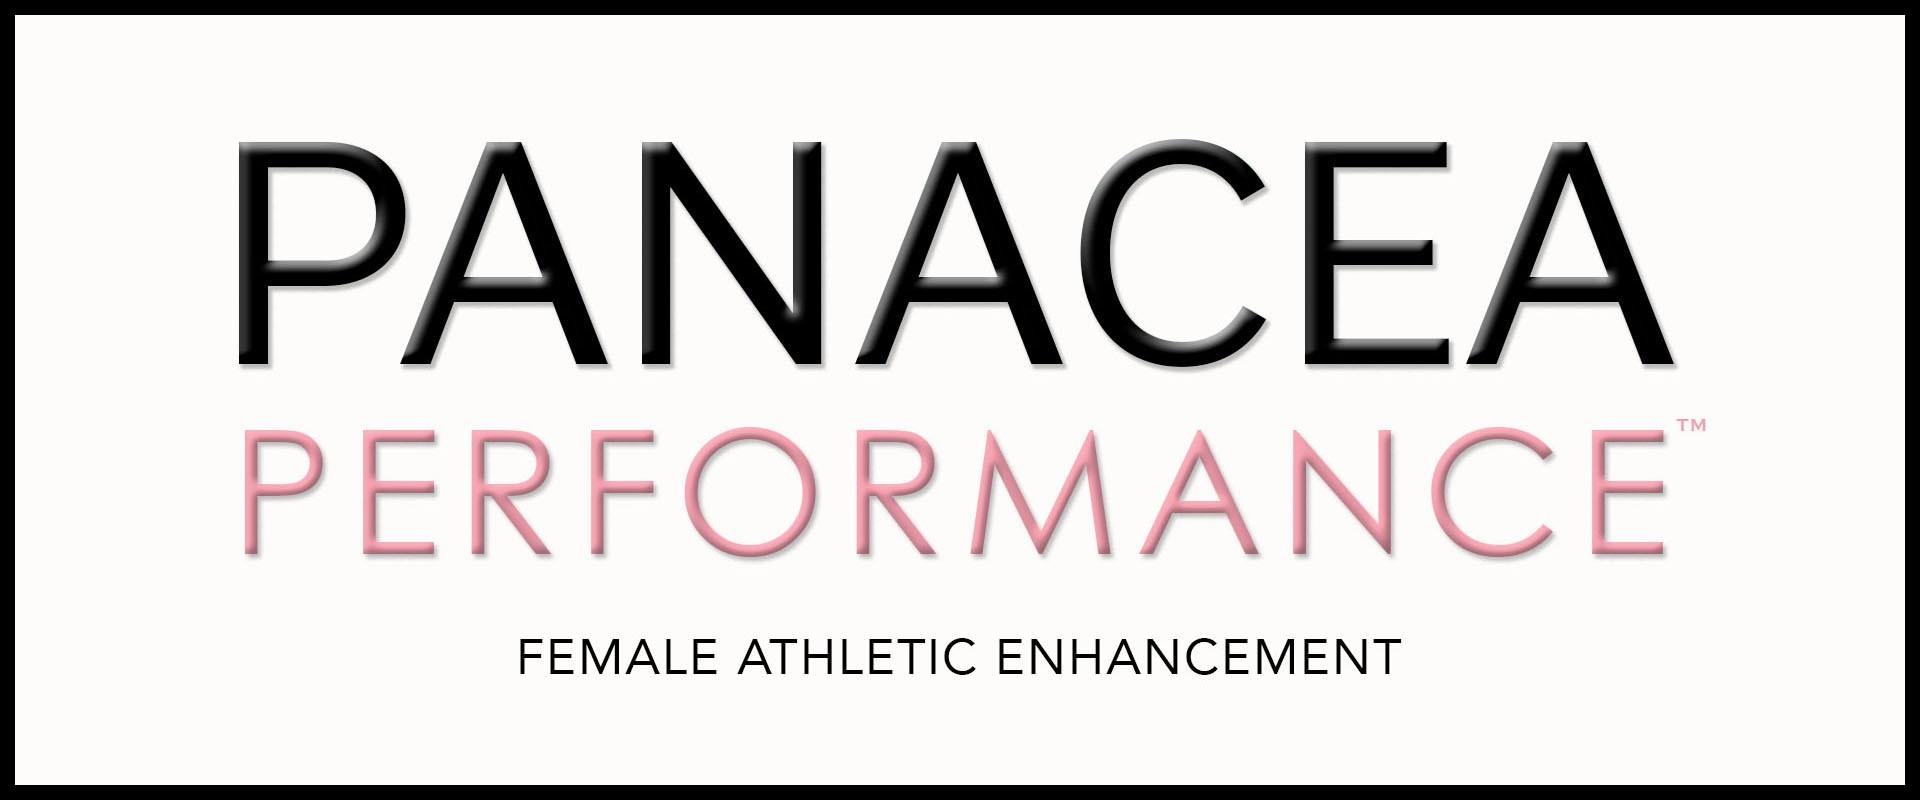 Female Athletic Enhancement